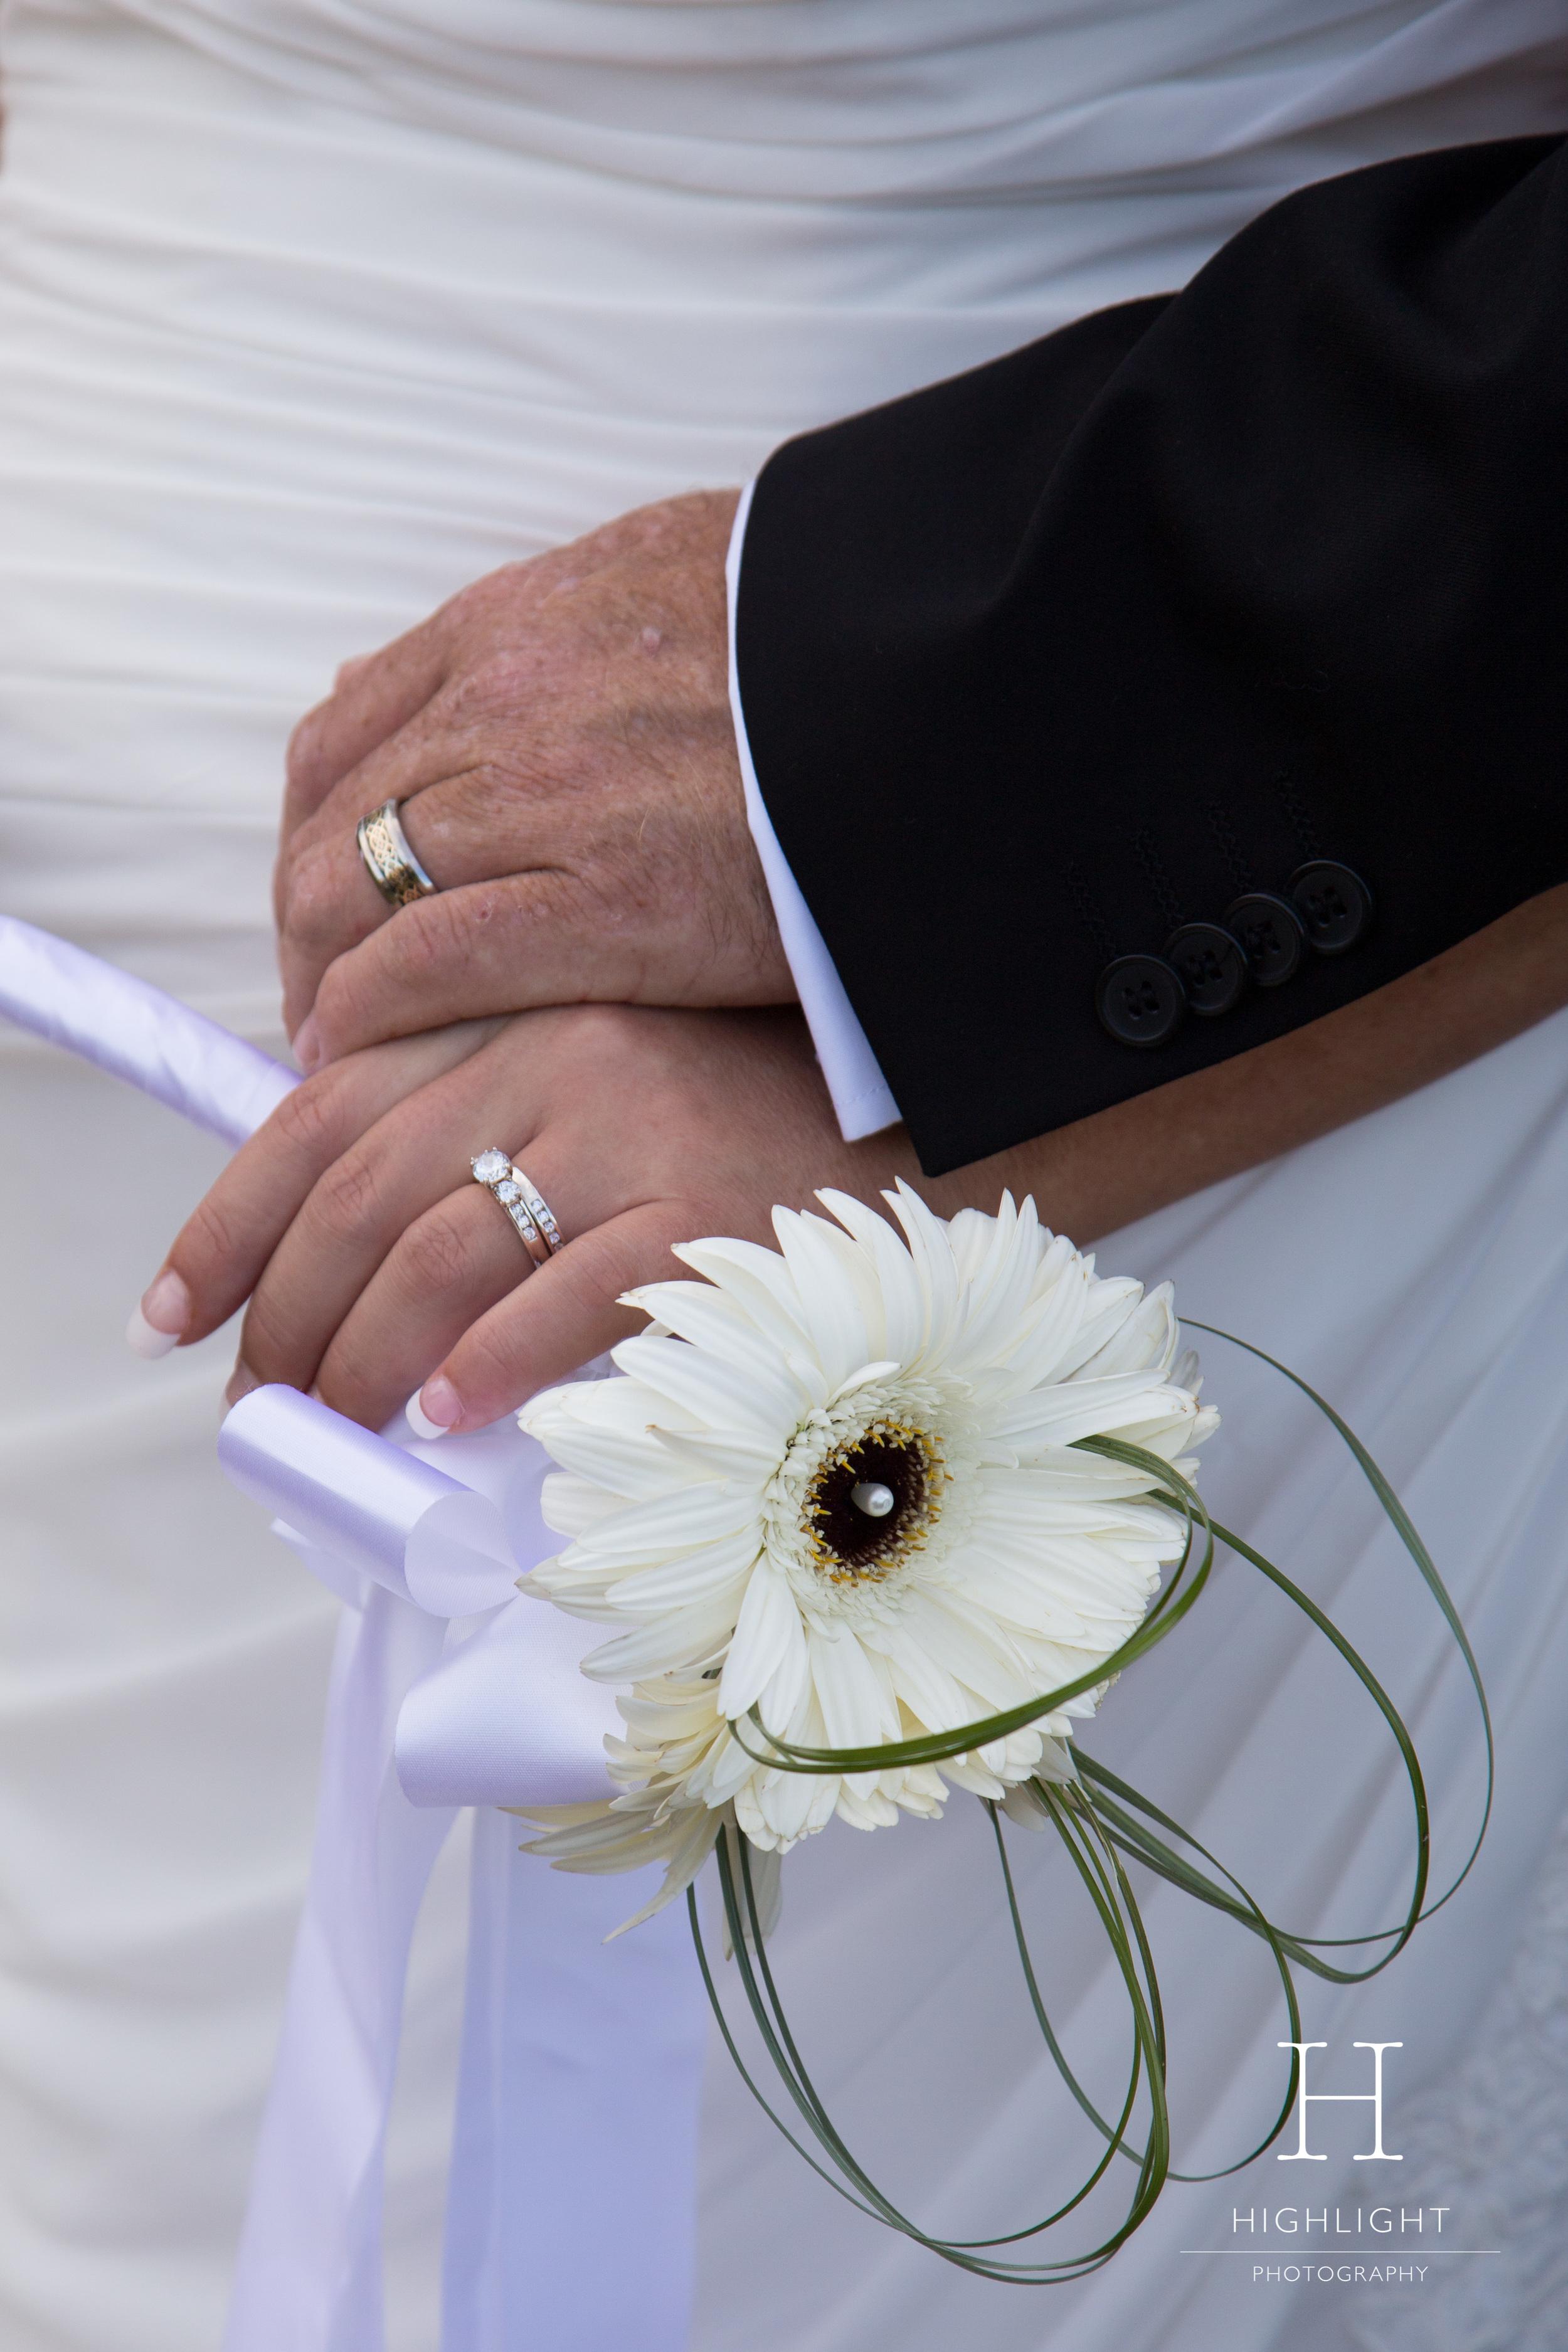 highlight-wedding-photography_masterton_new-zealand.jpg